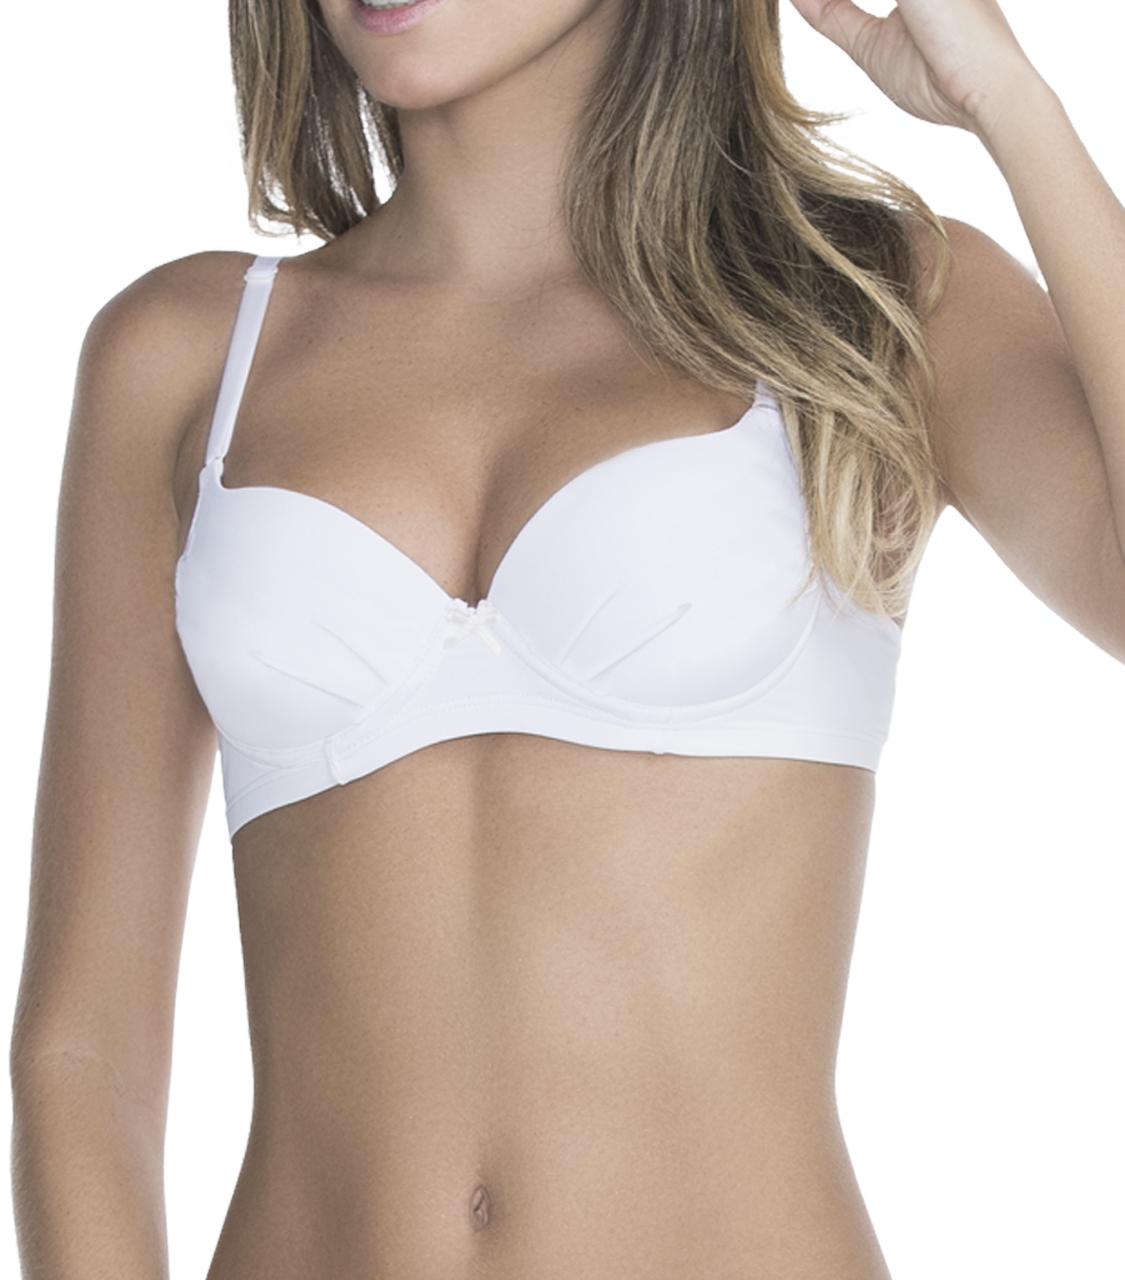 0d1d5812c Descubra quais lingeries combinam com seu tipo de corpo